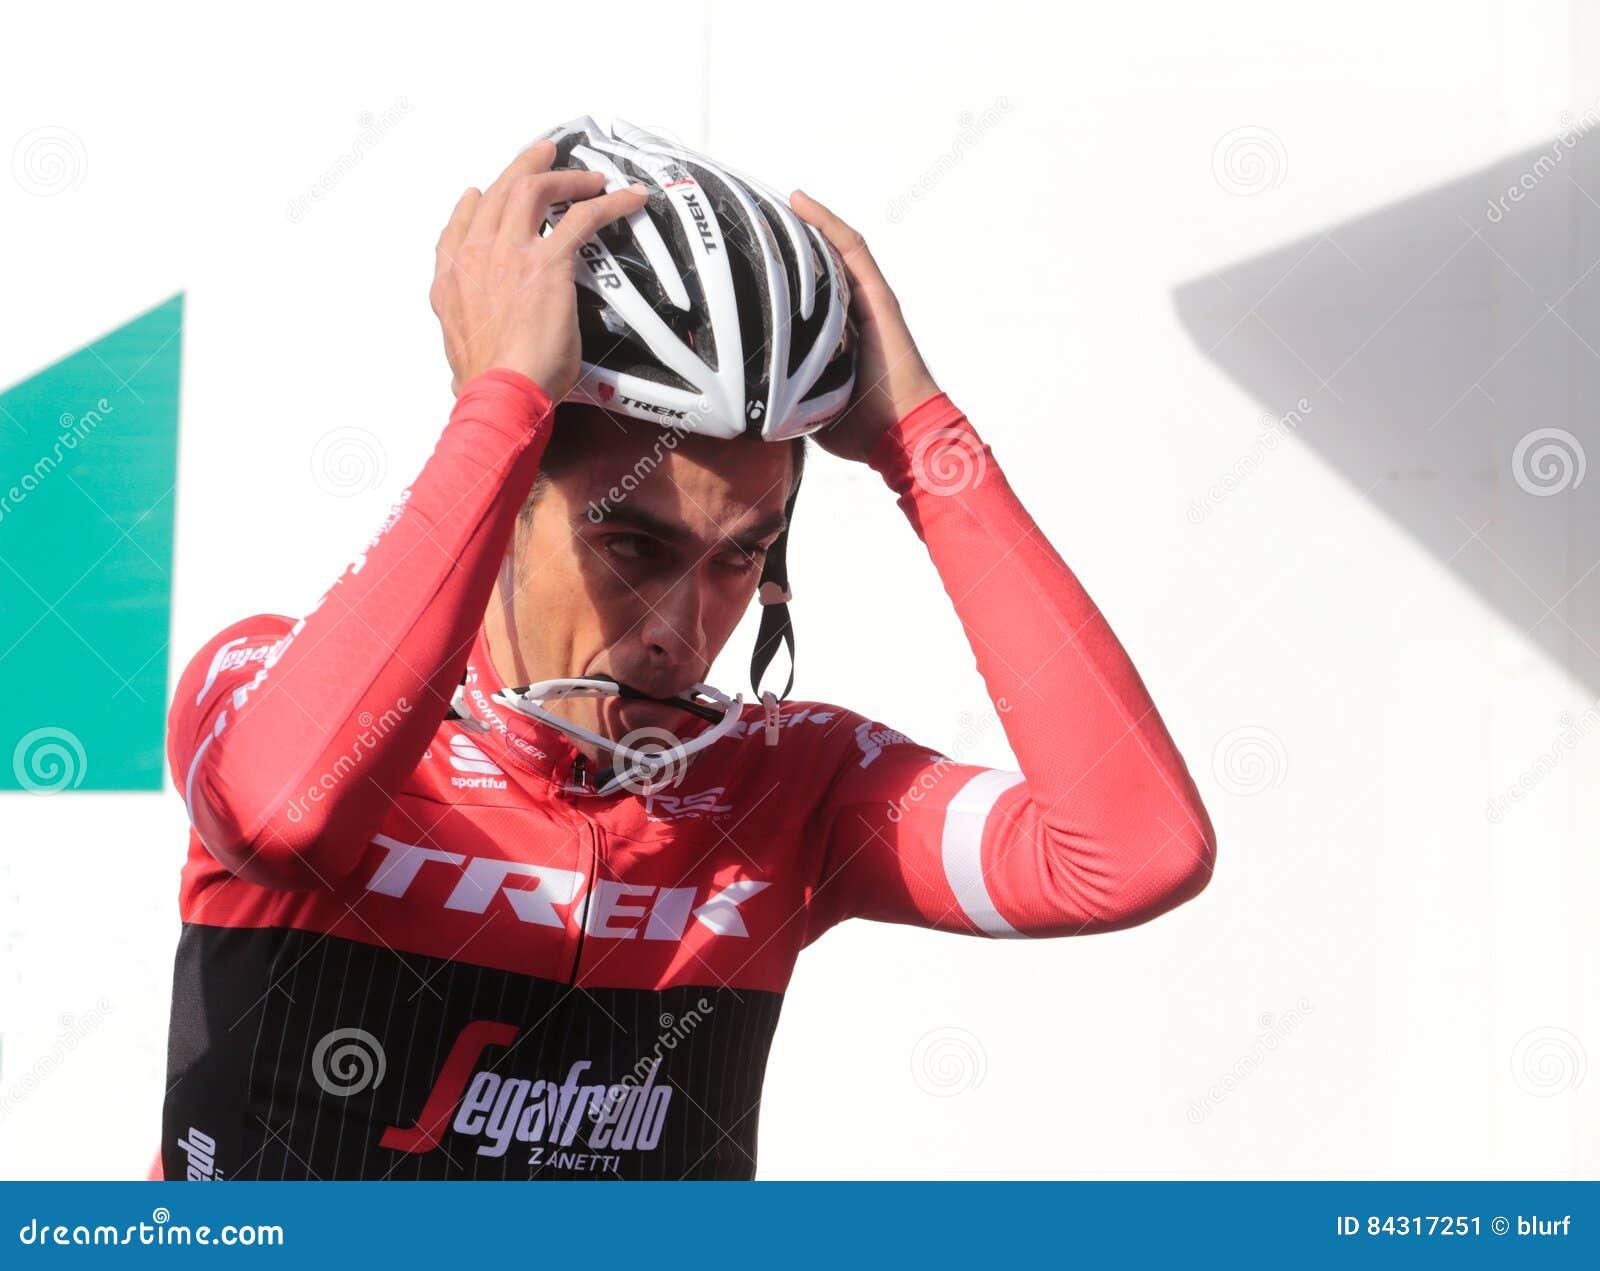 30f6afcd7 Team Trek Segafredo Cycling team new rider winner of the 3 majors races  giro